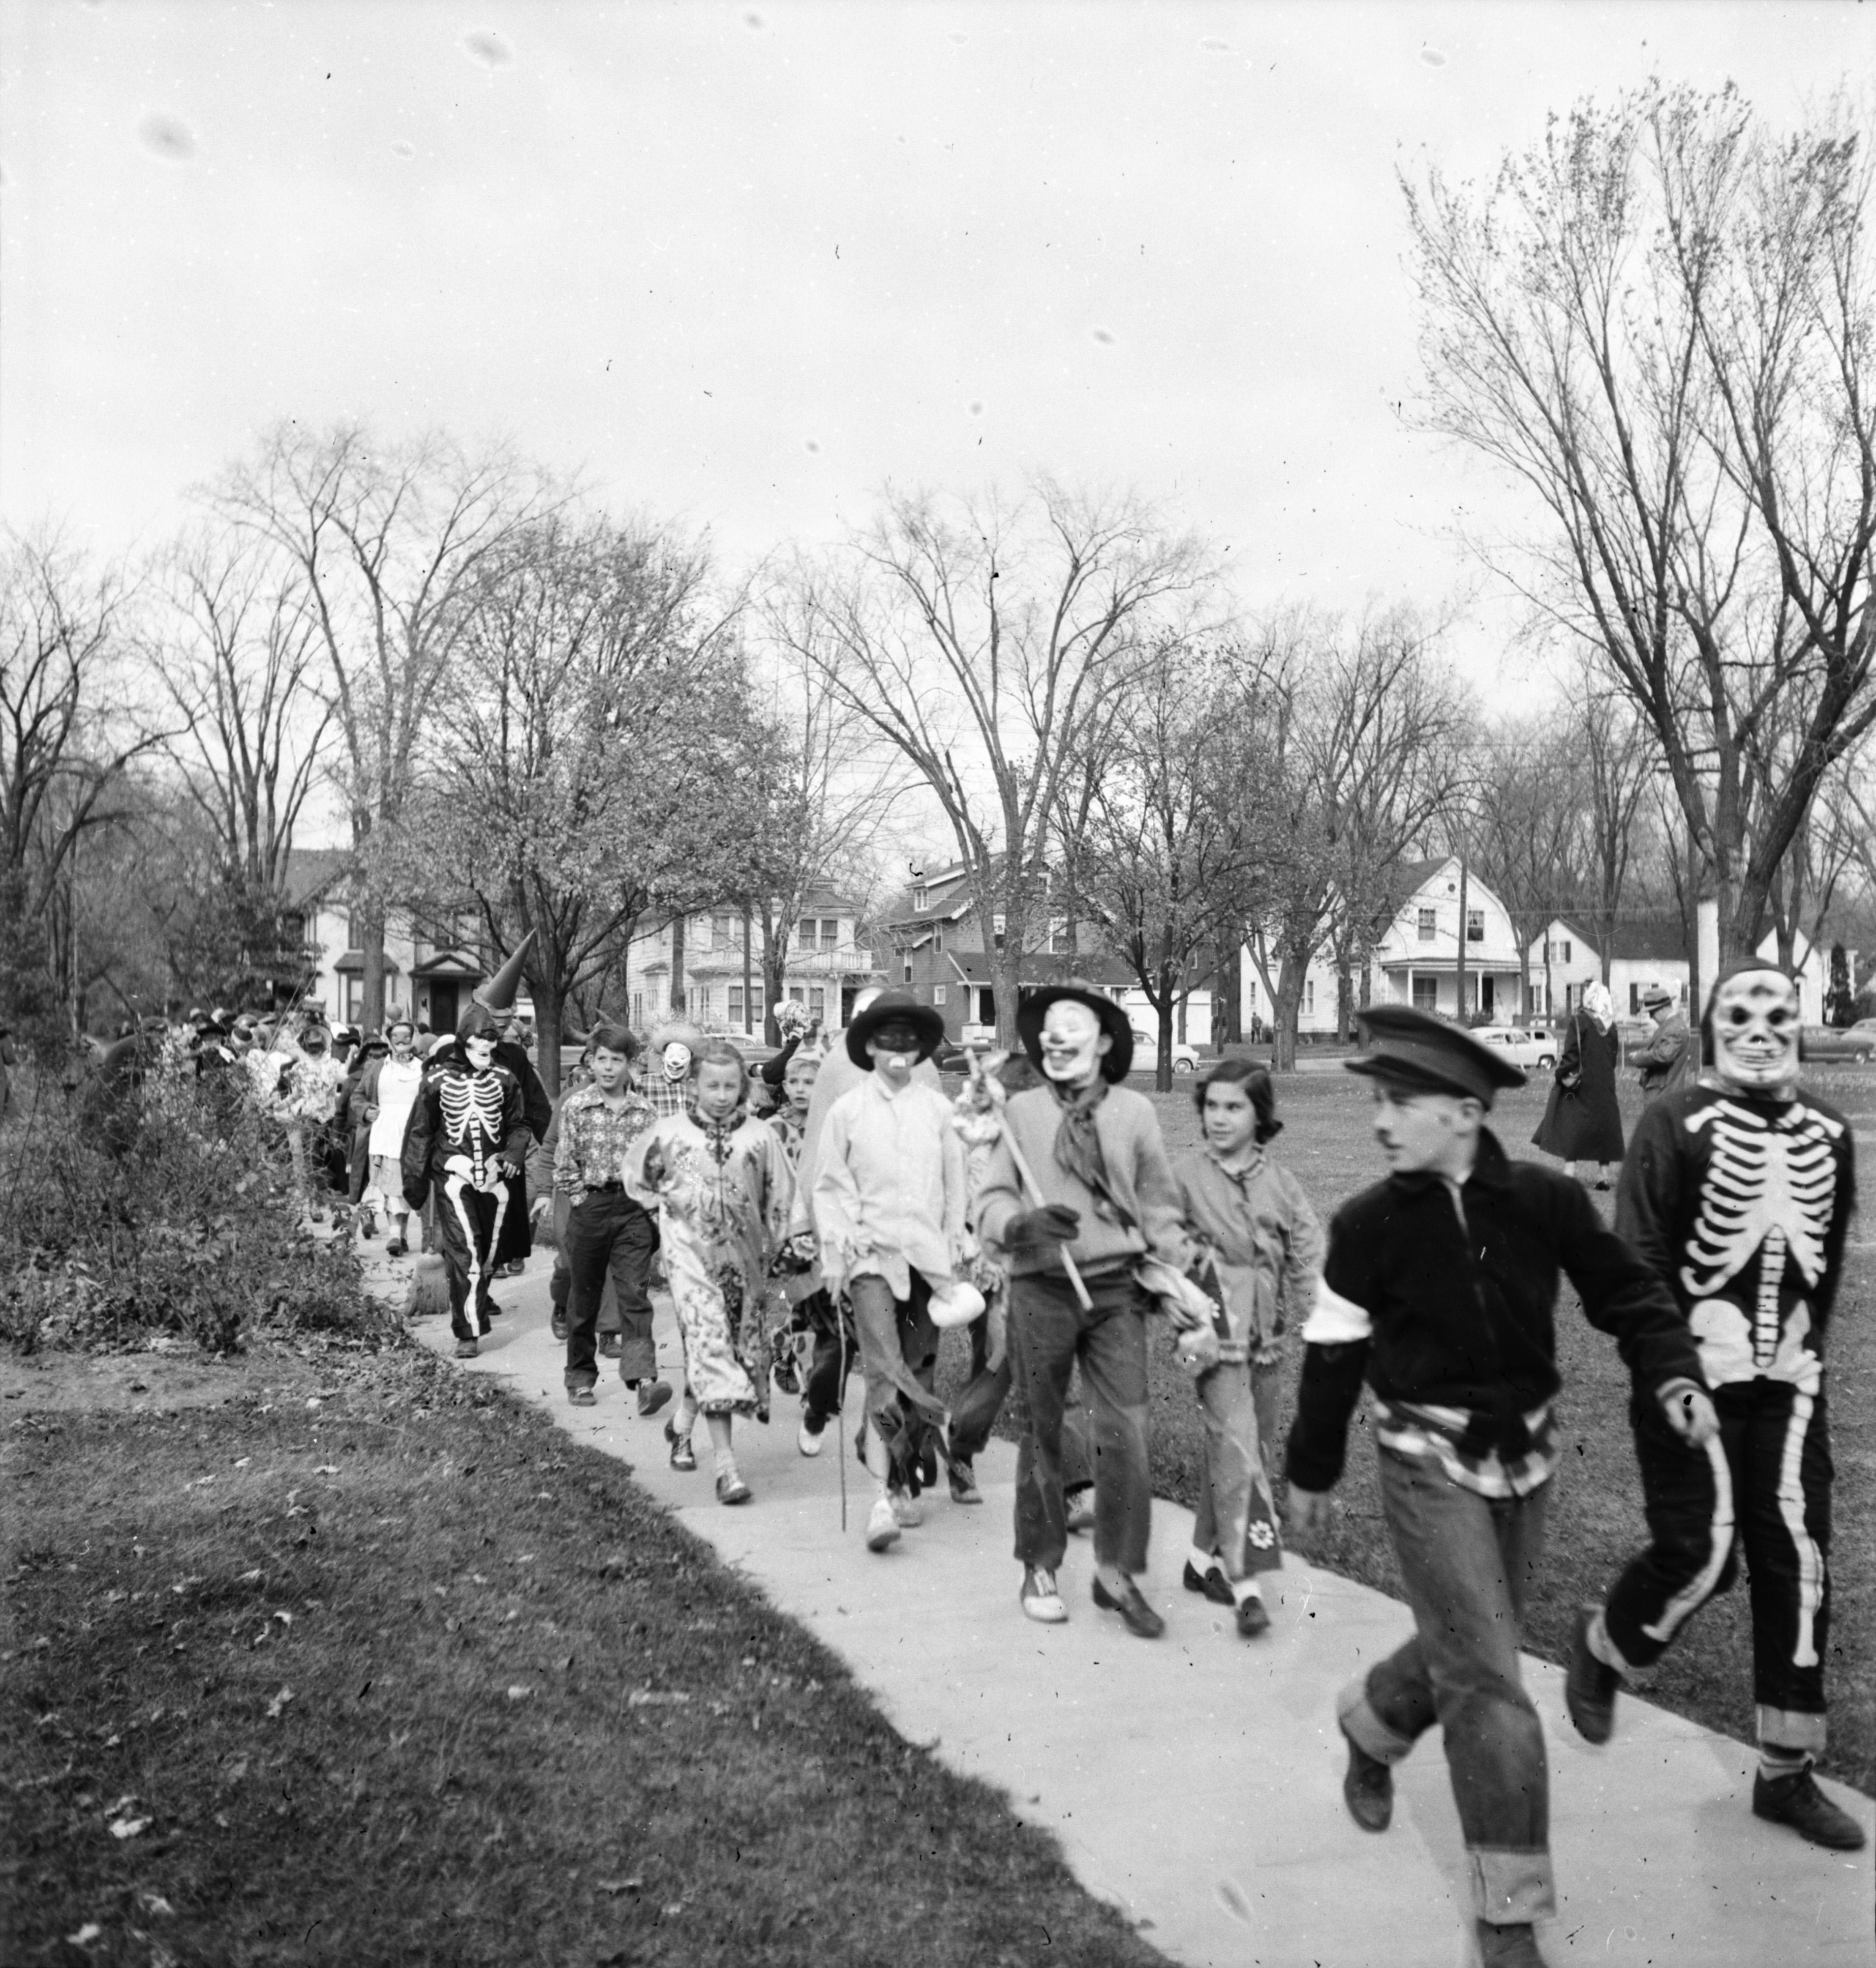 Hobos In The Burns Park School Halloween Parade, 1951